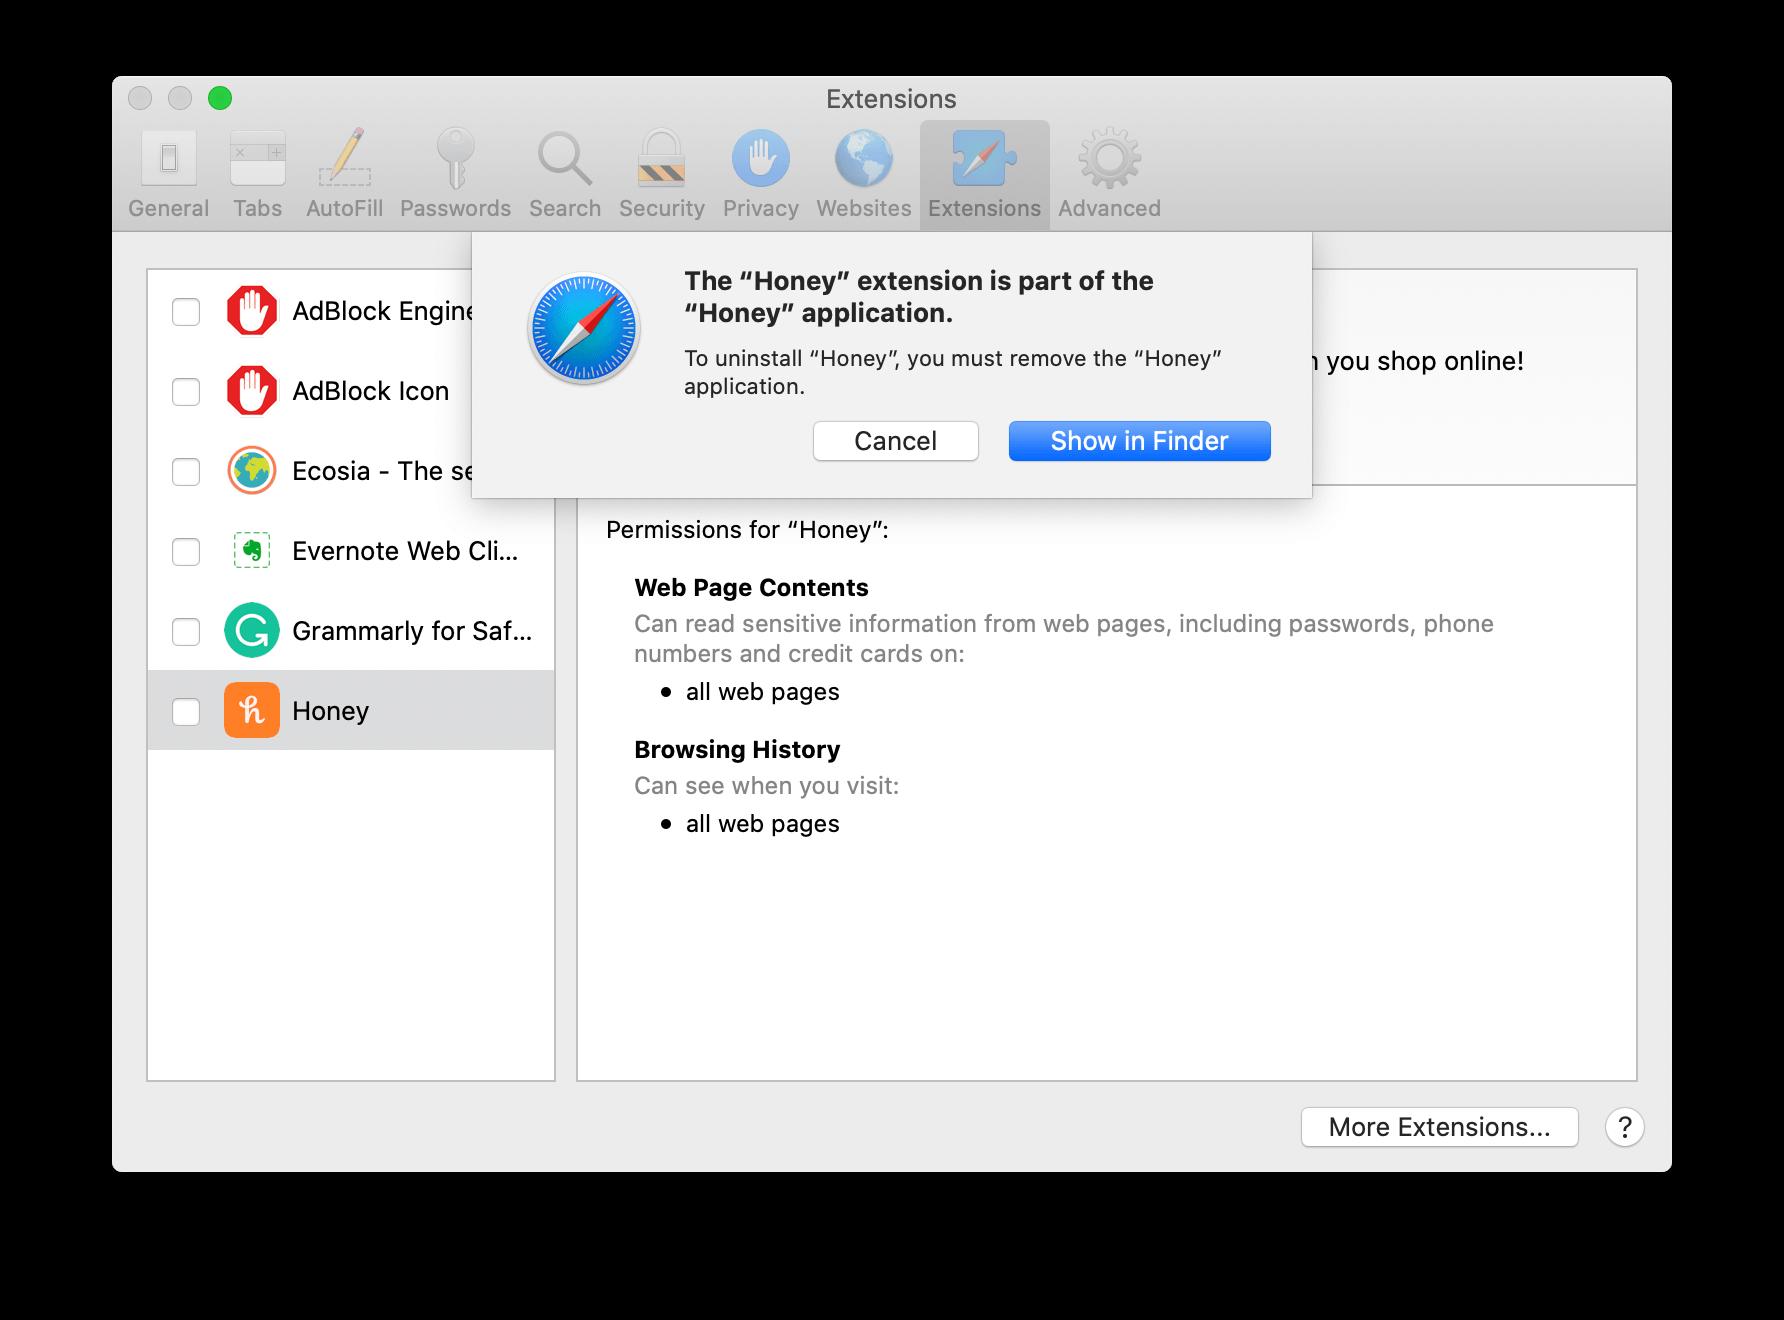 Safari notification window to uninstall Honey application